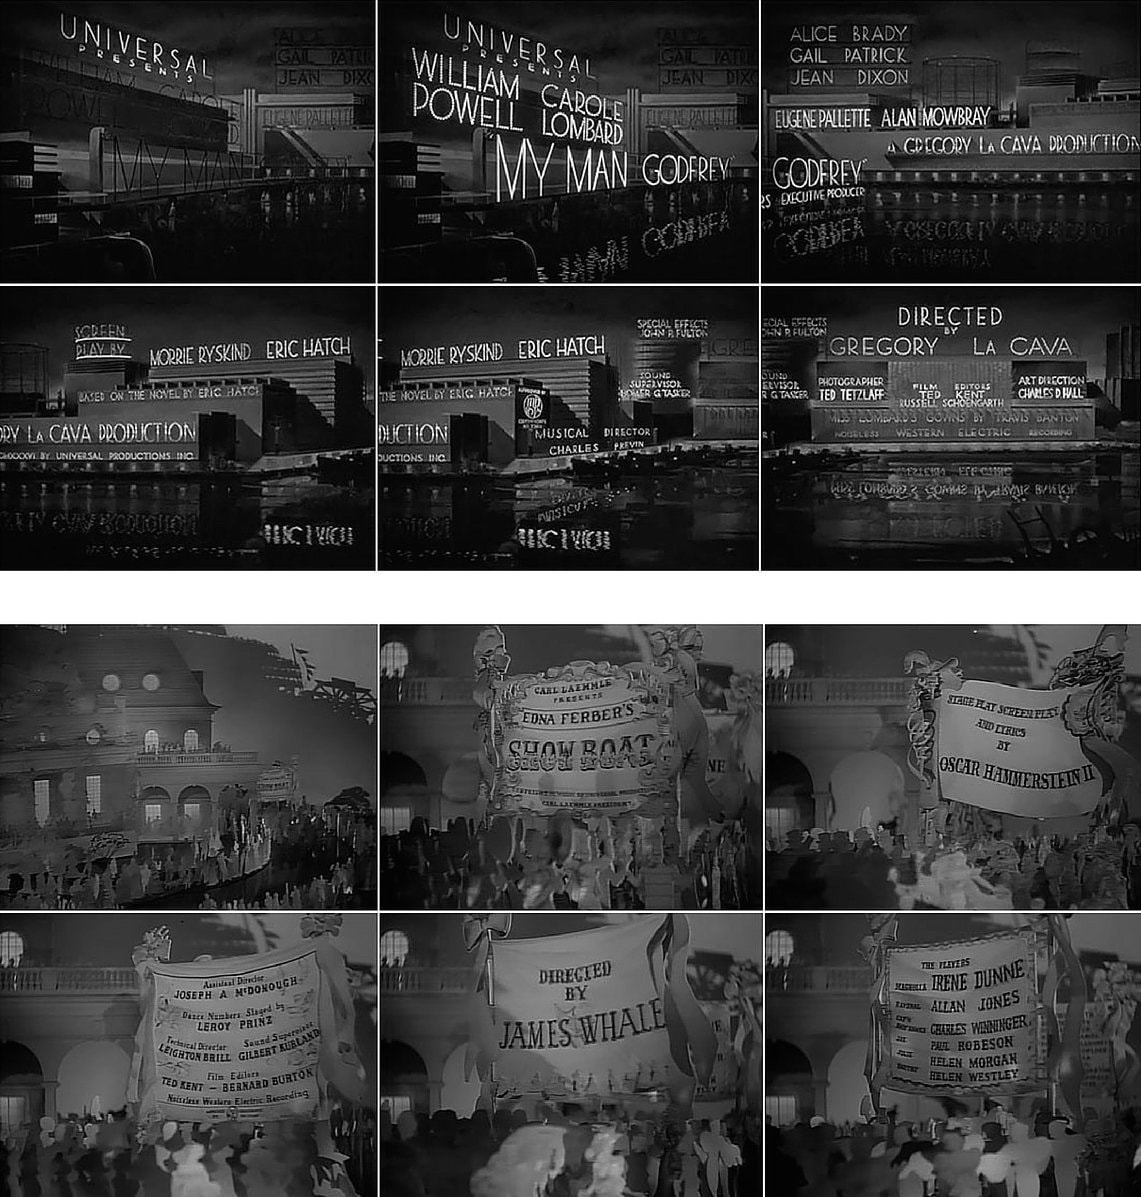 08. My Man Godfrey 1936 and Showboat 1936